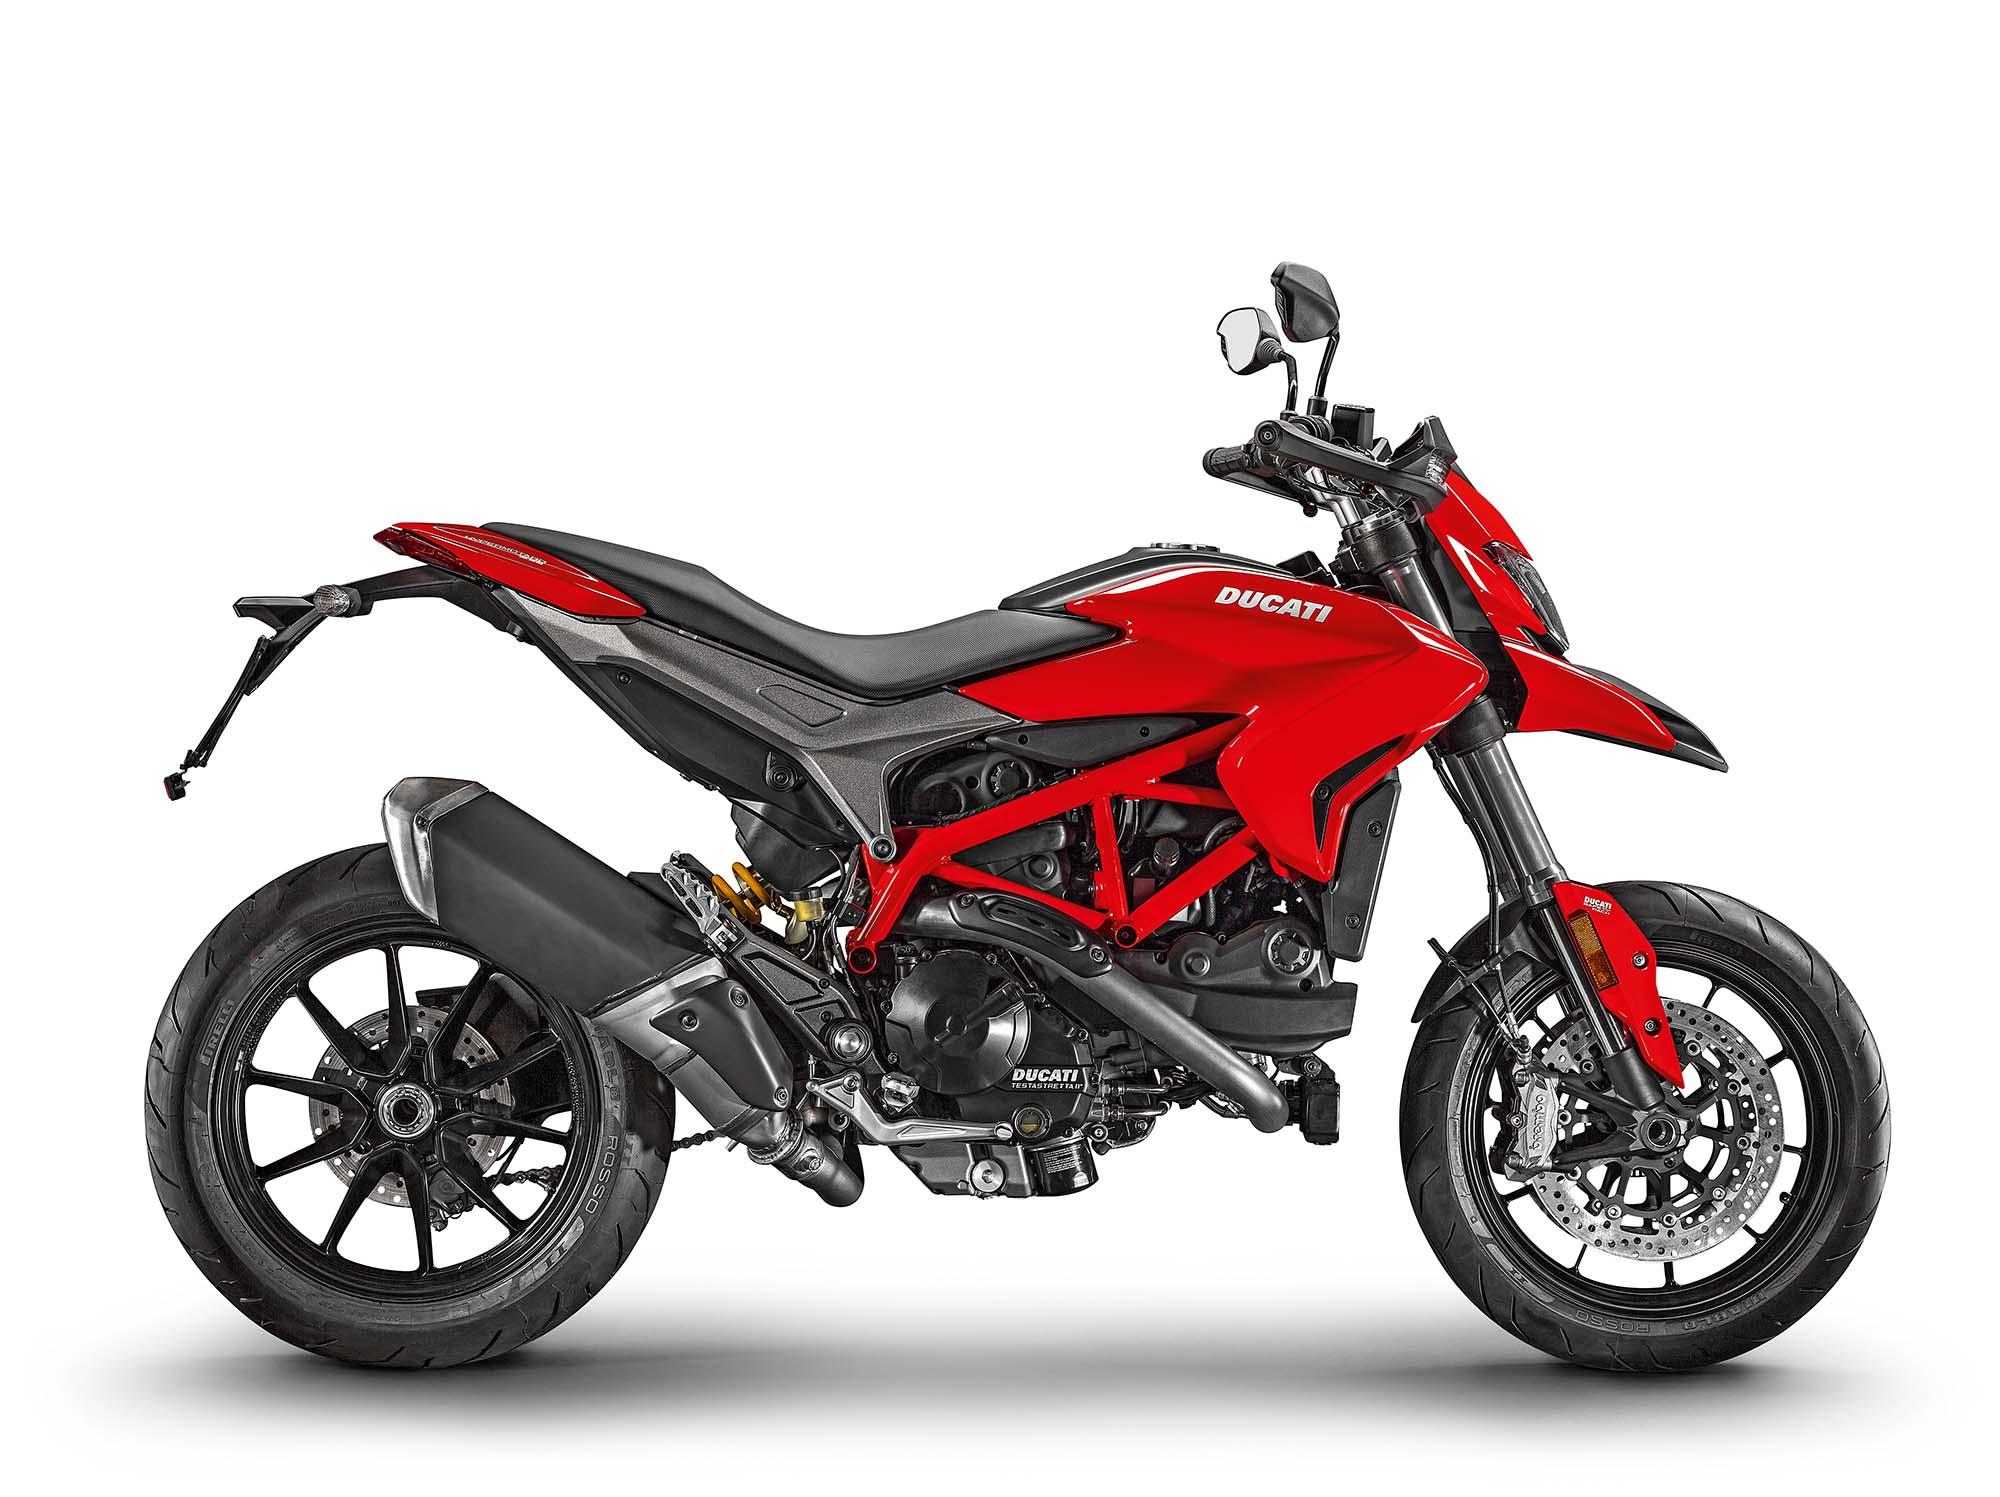 Ducati Hypermotard 939 Mega Gallery - Asphalt & Rubber